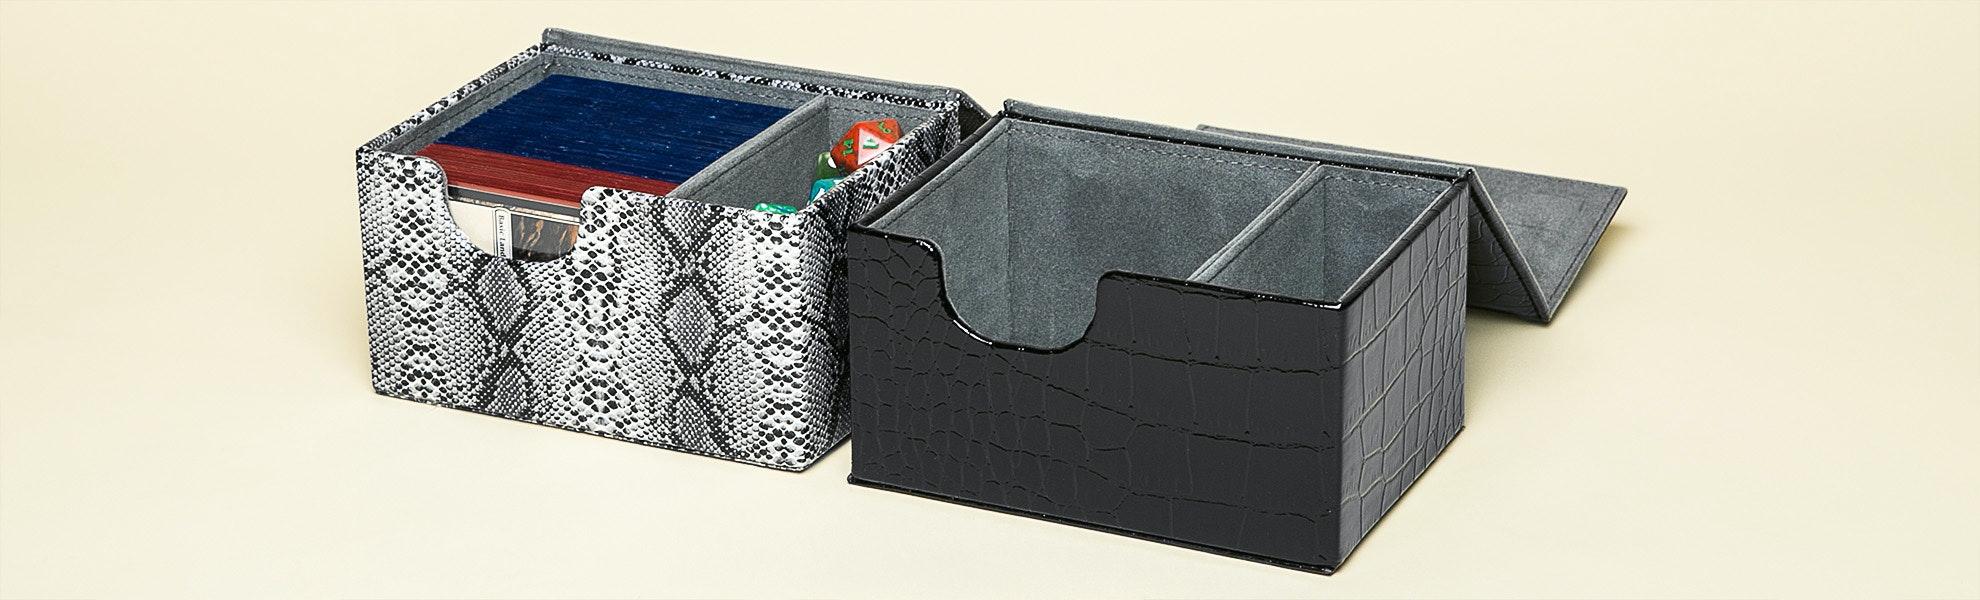 Dex Protection Medium Safari Deck Box (2-Pack)